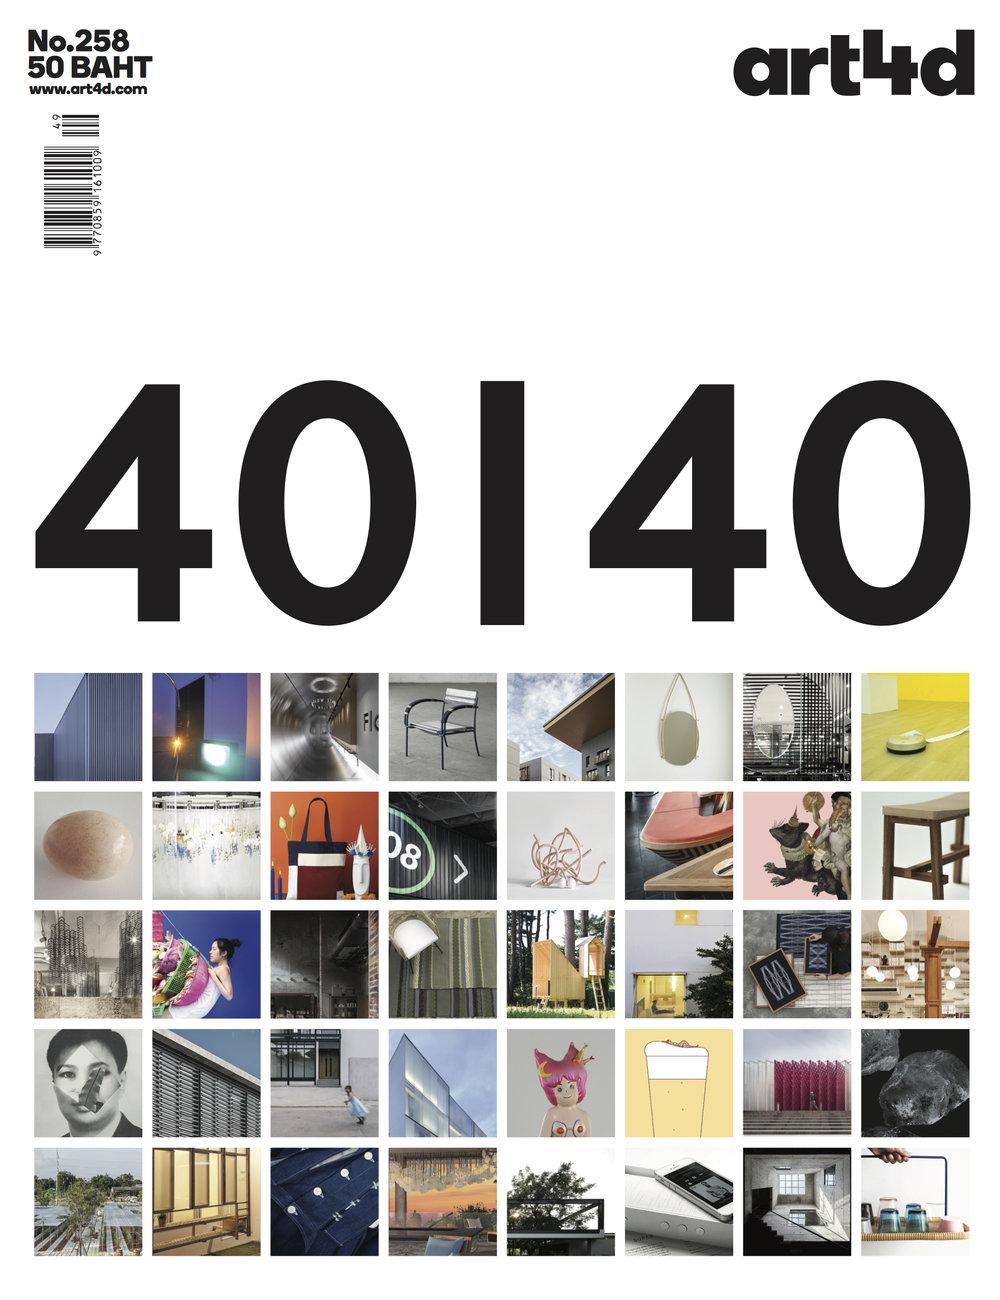 art4d no. 258 - 40 under 40 - May, 2018